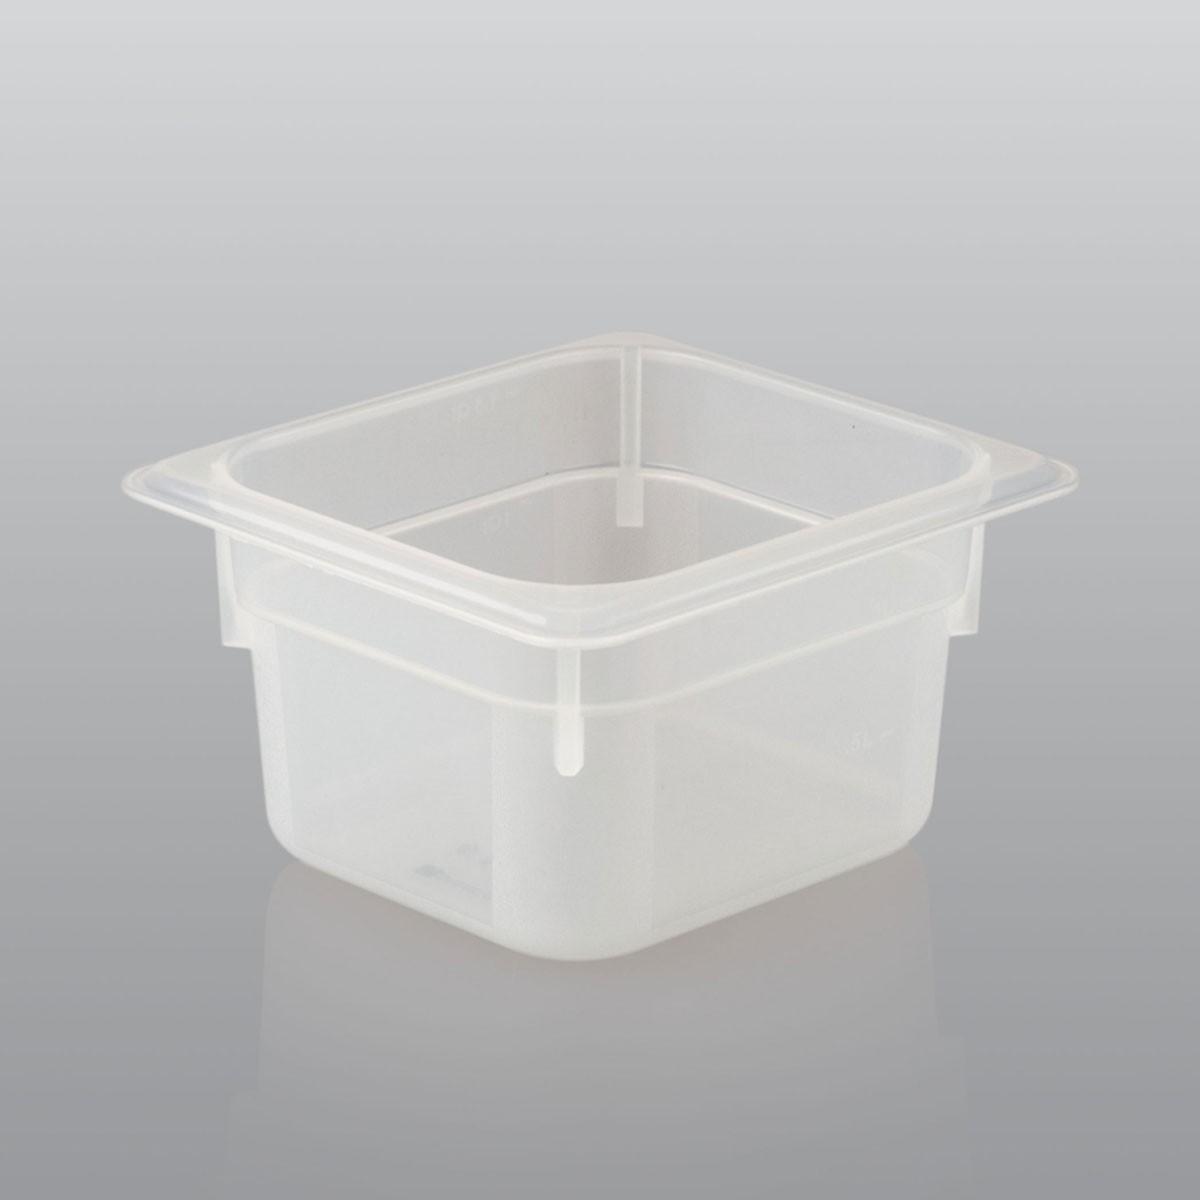 GN Behälter GN 1/6 aus Polypropylen (Tiefe: 150mm) 2,4 L Saro